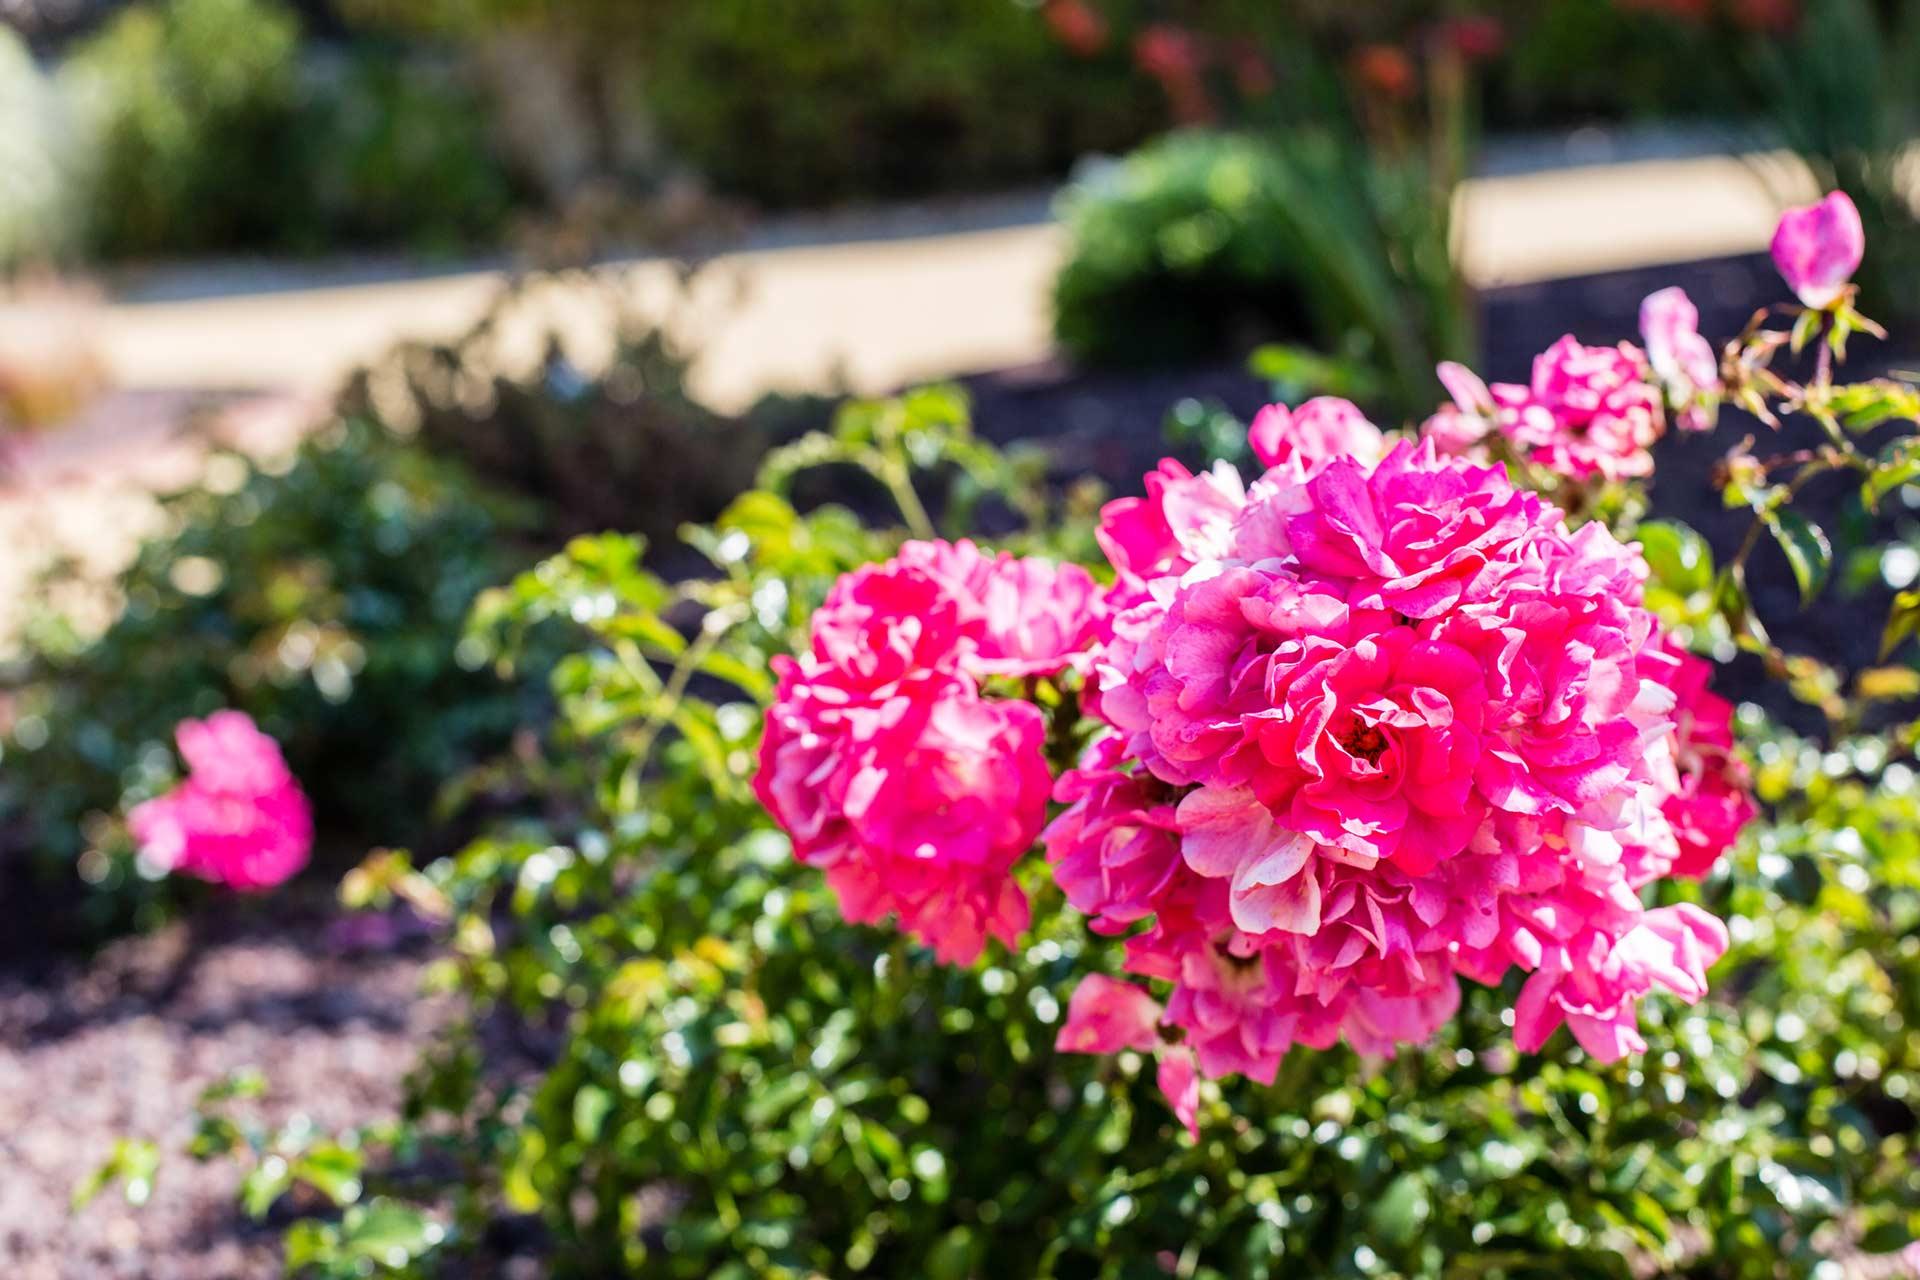 ManuPaysage - Fleurs et jardins emmanuel loirat paysagiste herbignac